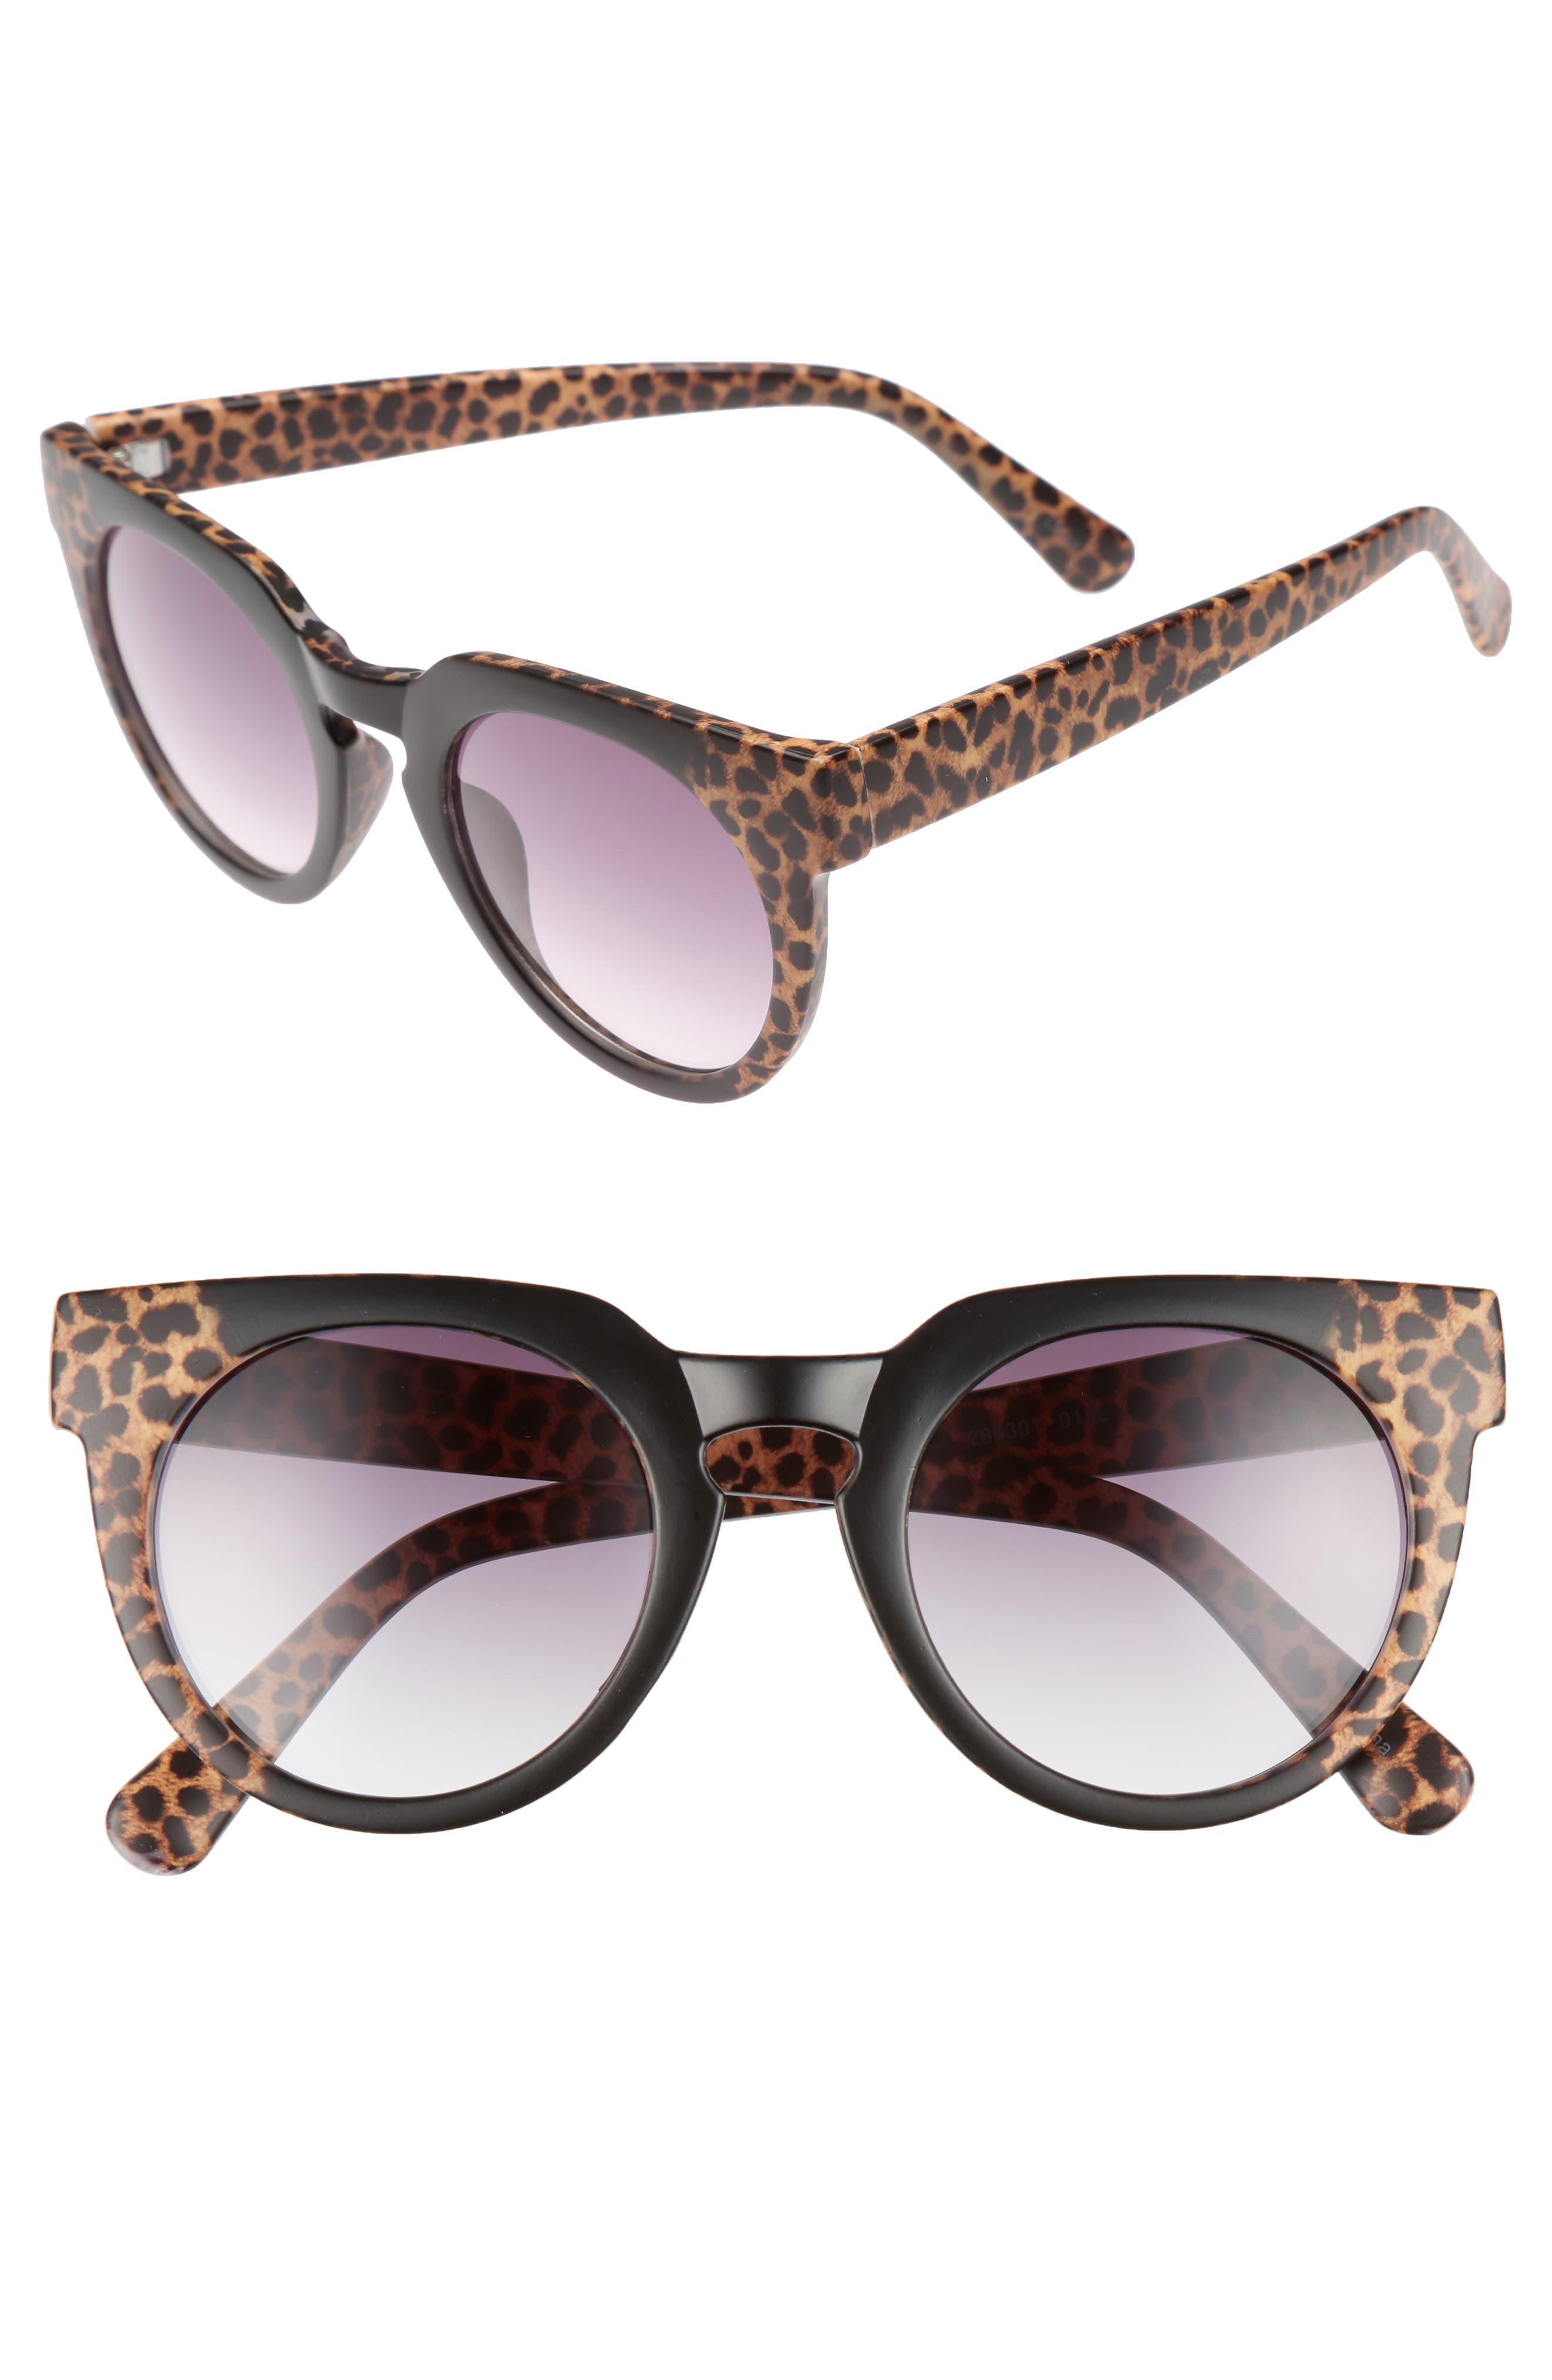 47mm Animal Print Round Sunglasses,                         Main,                         color, Black